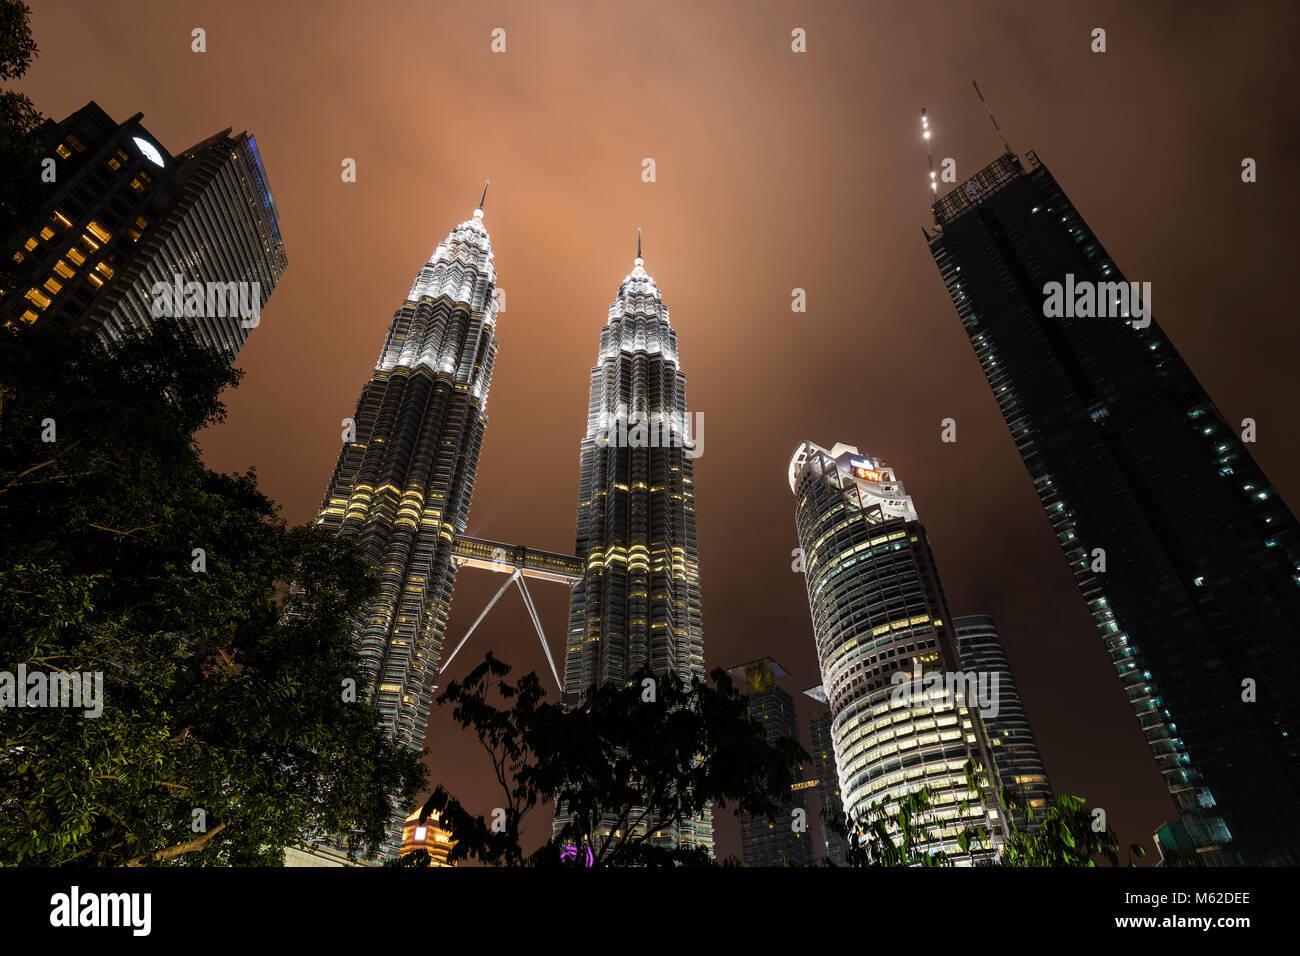 KUALA LUMPUR, MALAYSIA, December 15, 2017: Majestic view of Petronas Twin Towers at night with dramatic sky - Stock Image